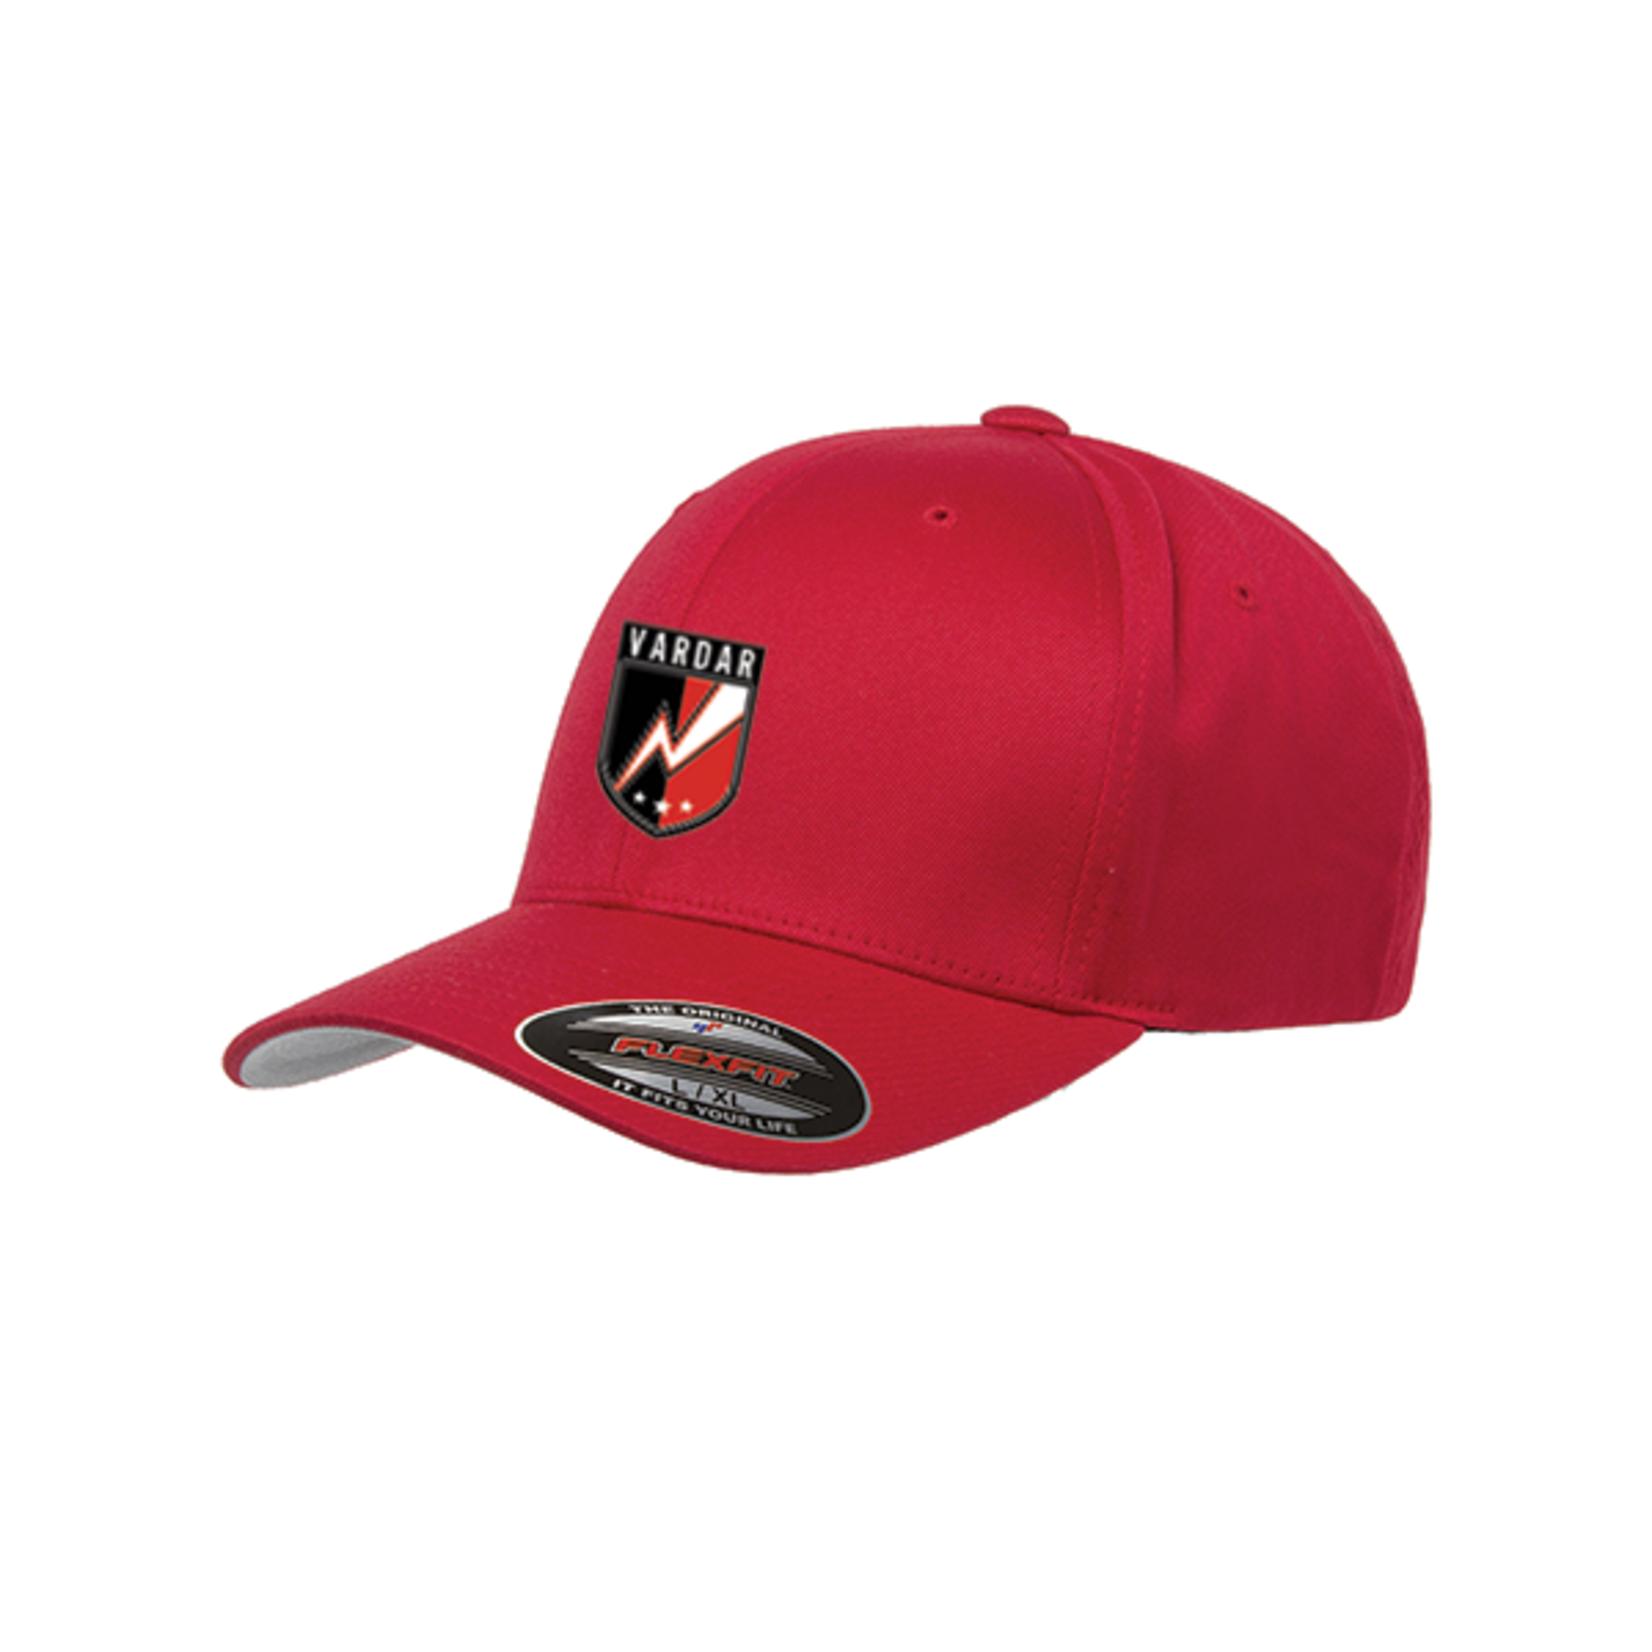 VARDAR FLEXFIT HAT